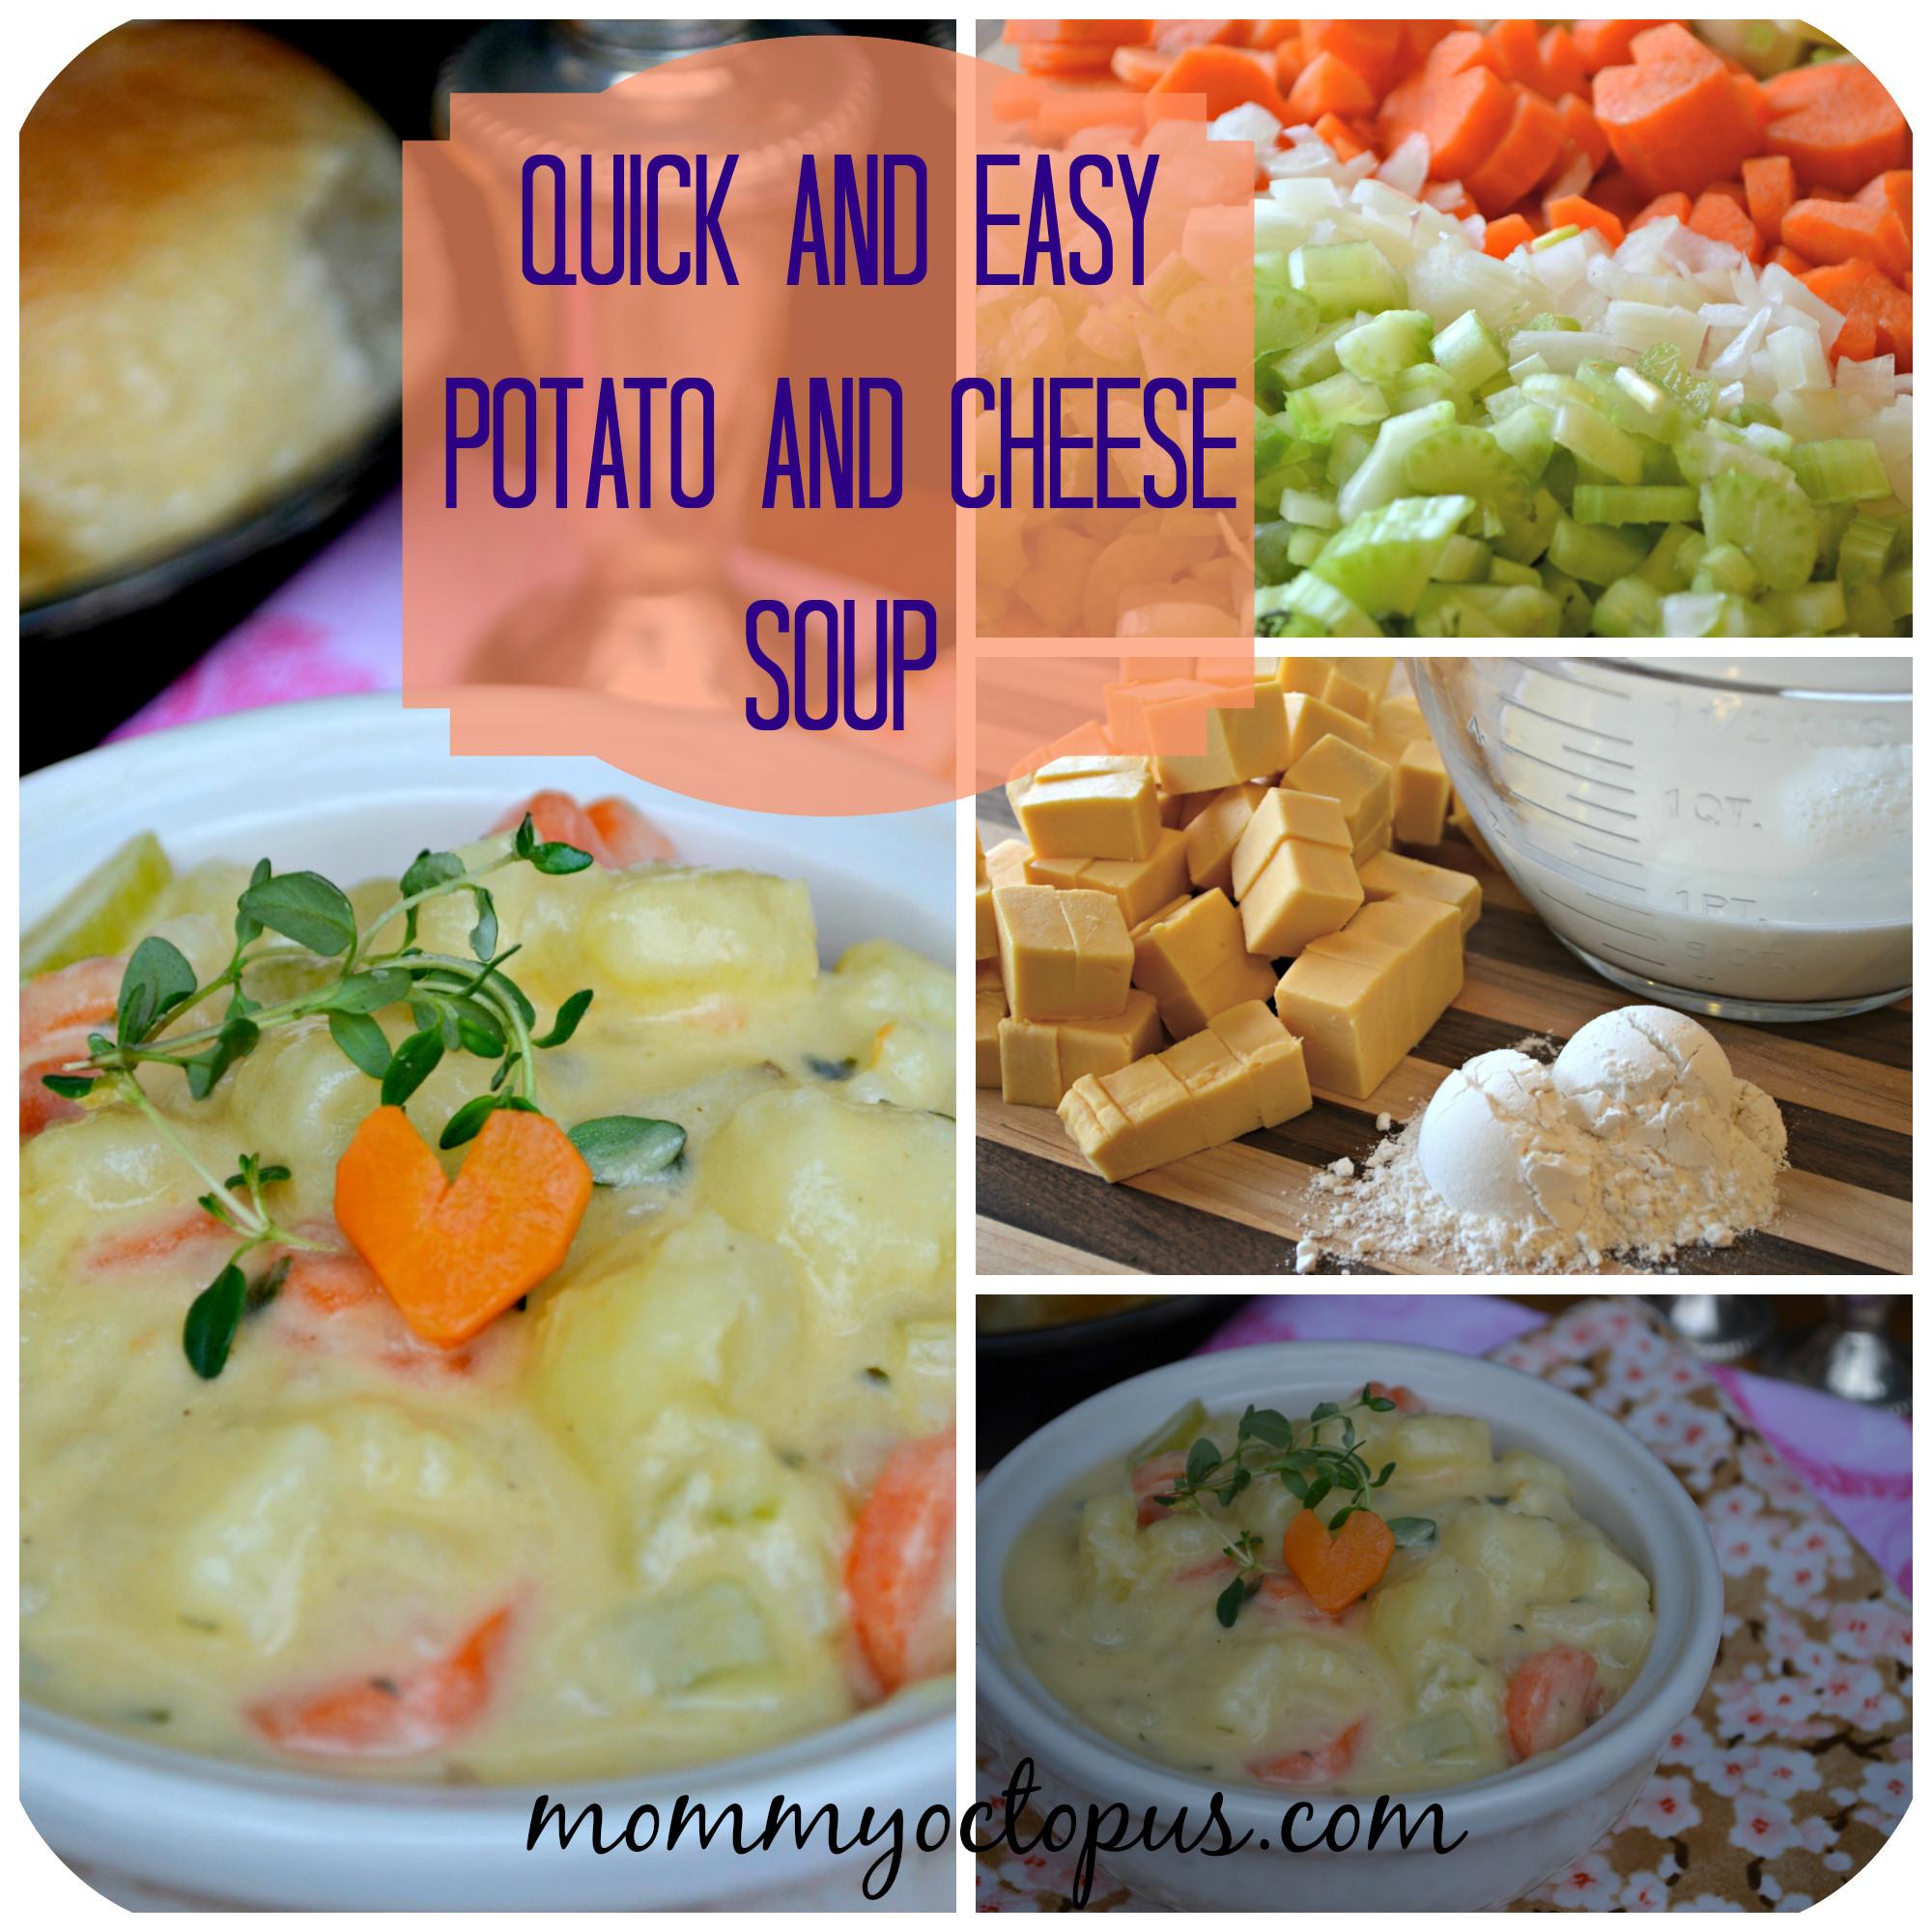 Quick Potato Recipes  Tasty Tuesday Quick and Easy Potato Cheese Soup Recipe